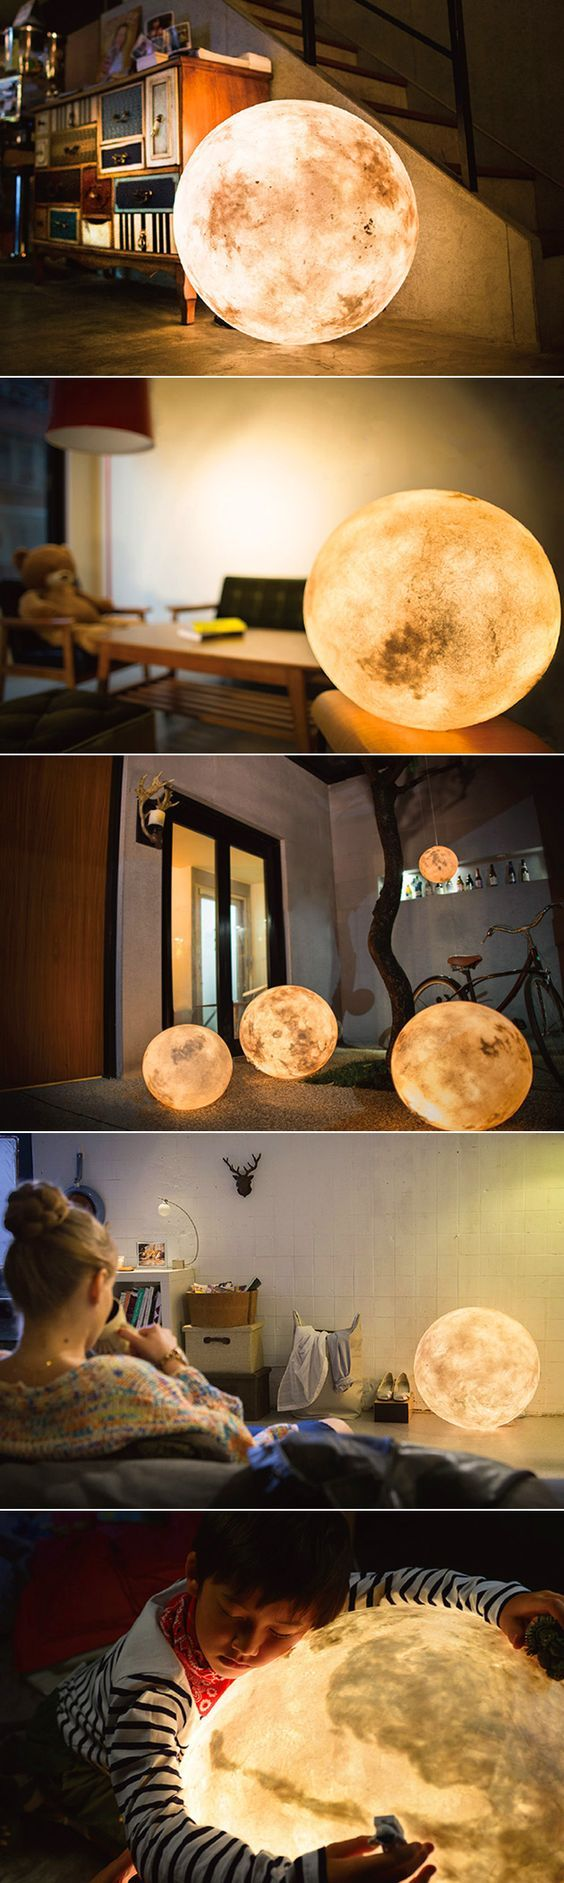 Luna: A Lantern That Looks Like a Moon